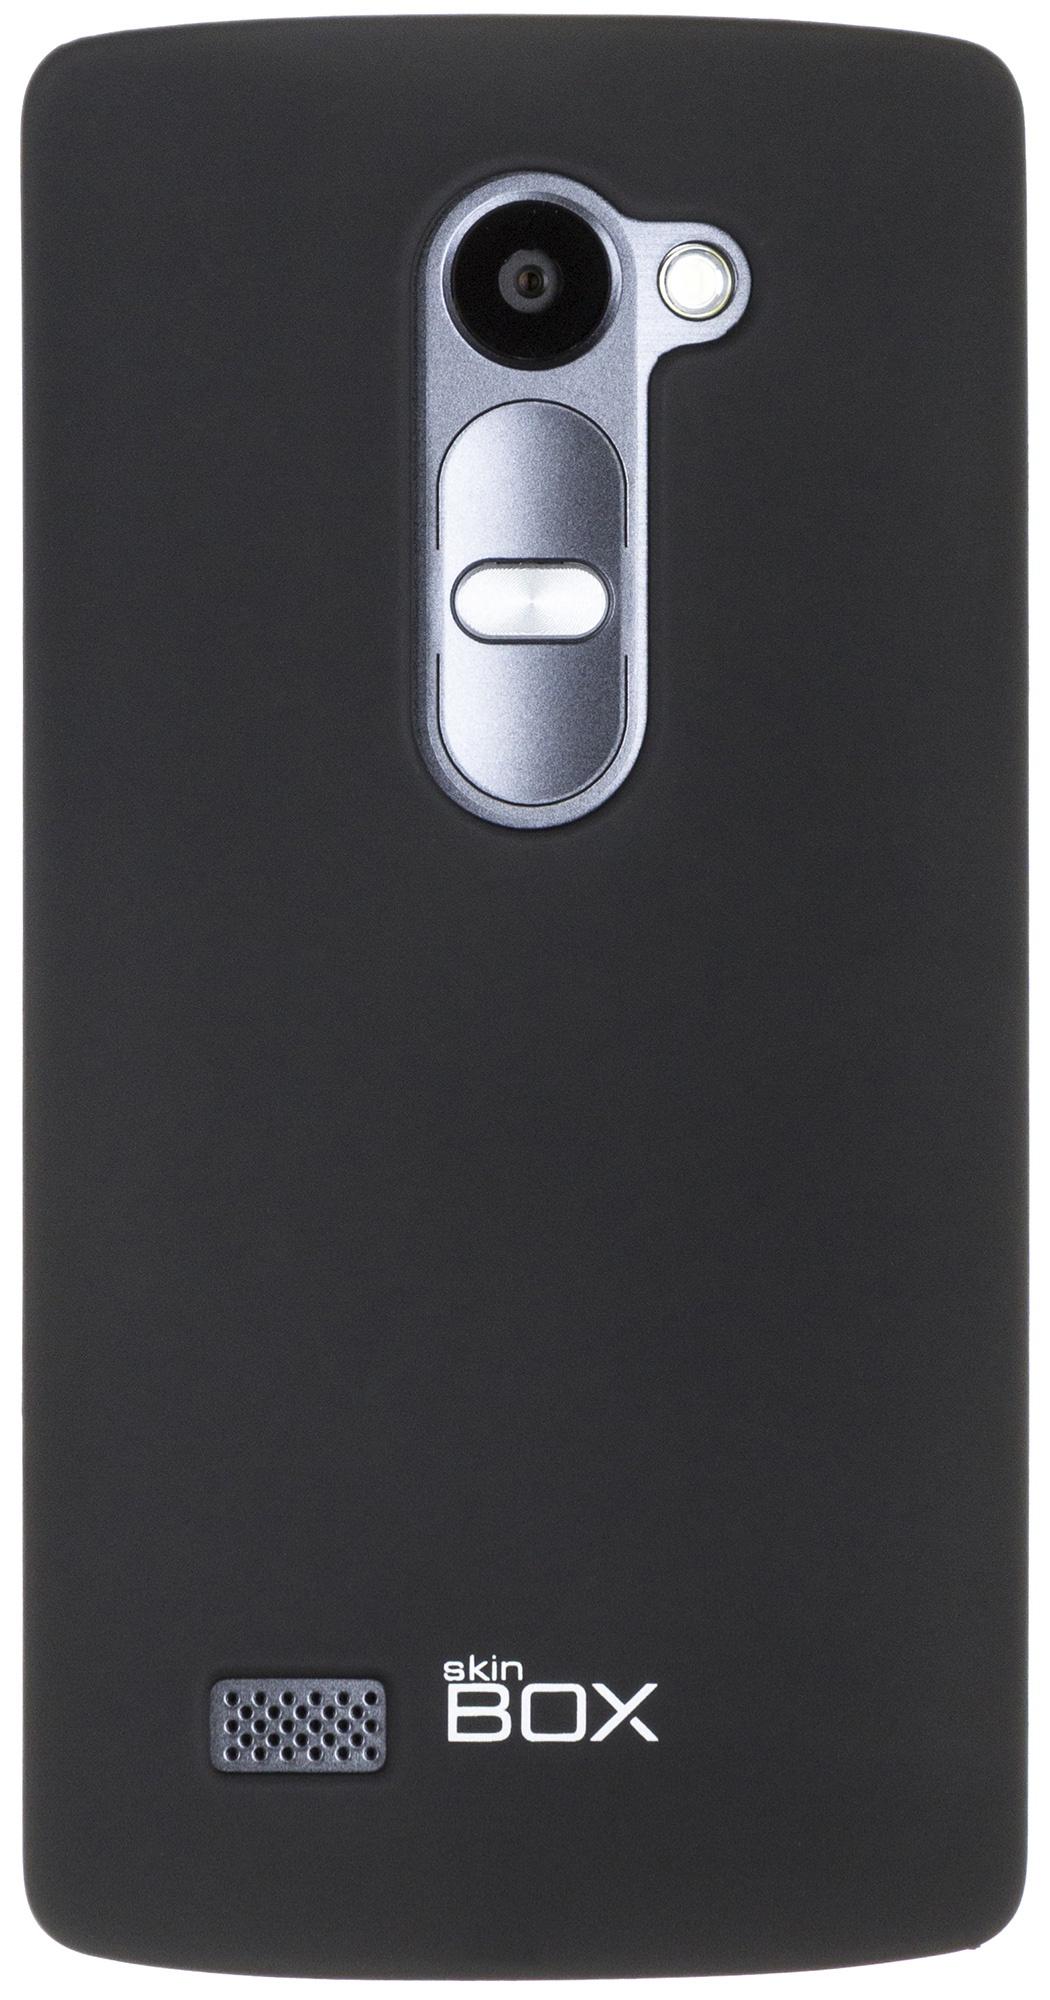 Накладка skinBOX для LG Leon, 2000000074030, черный